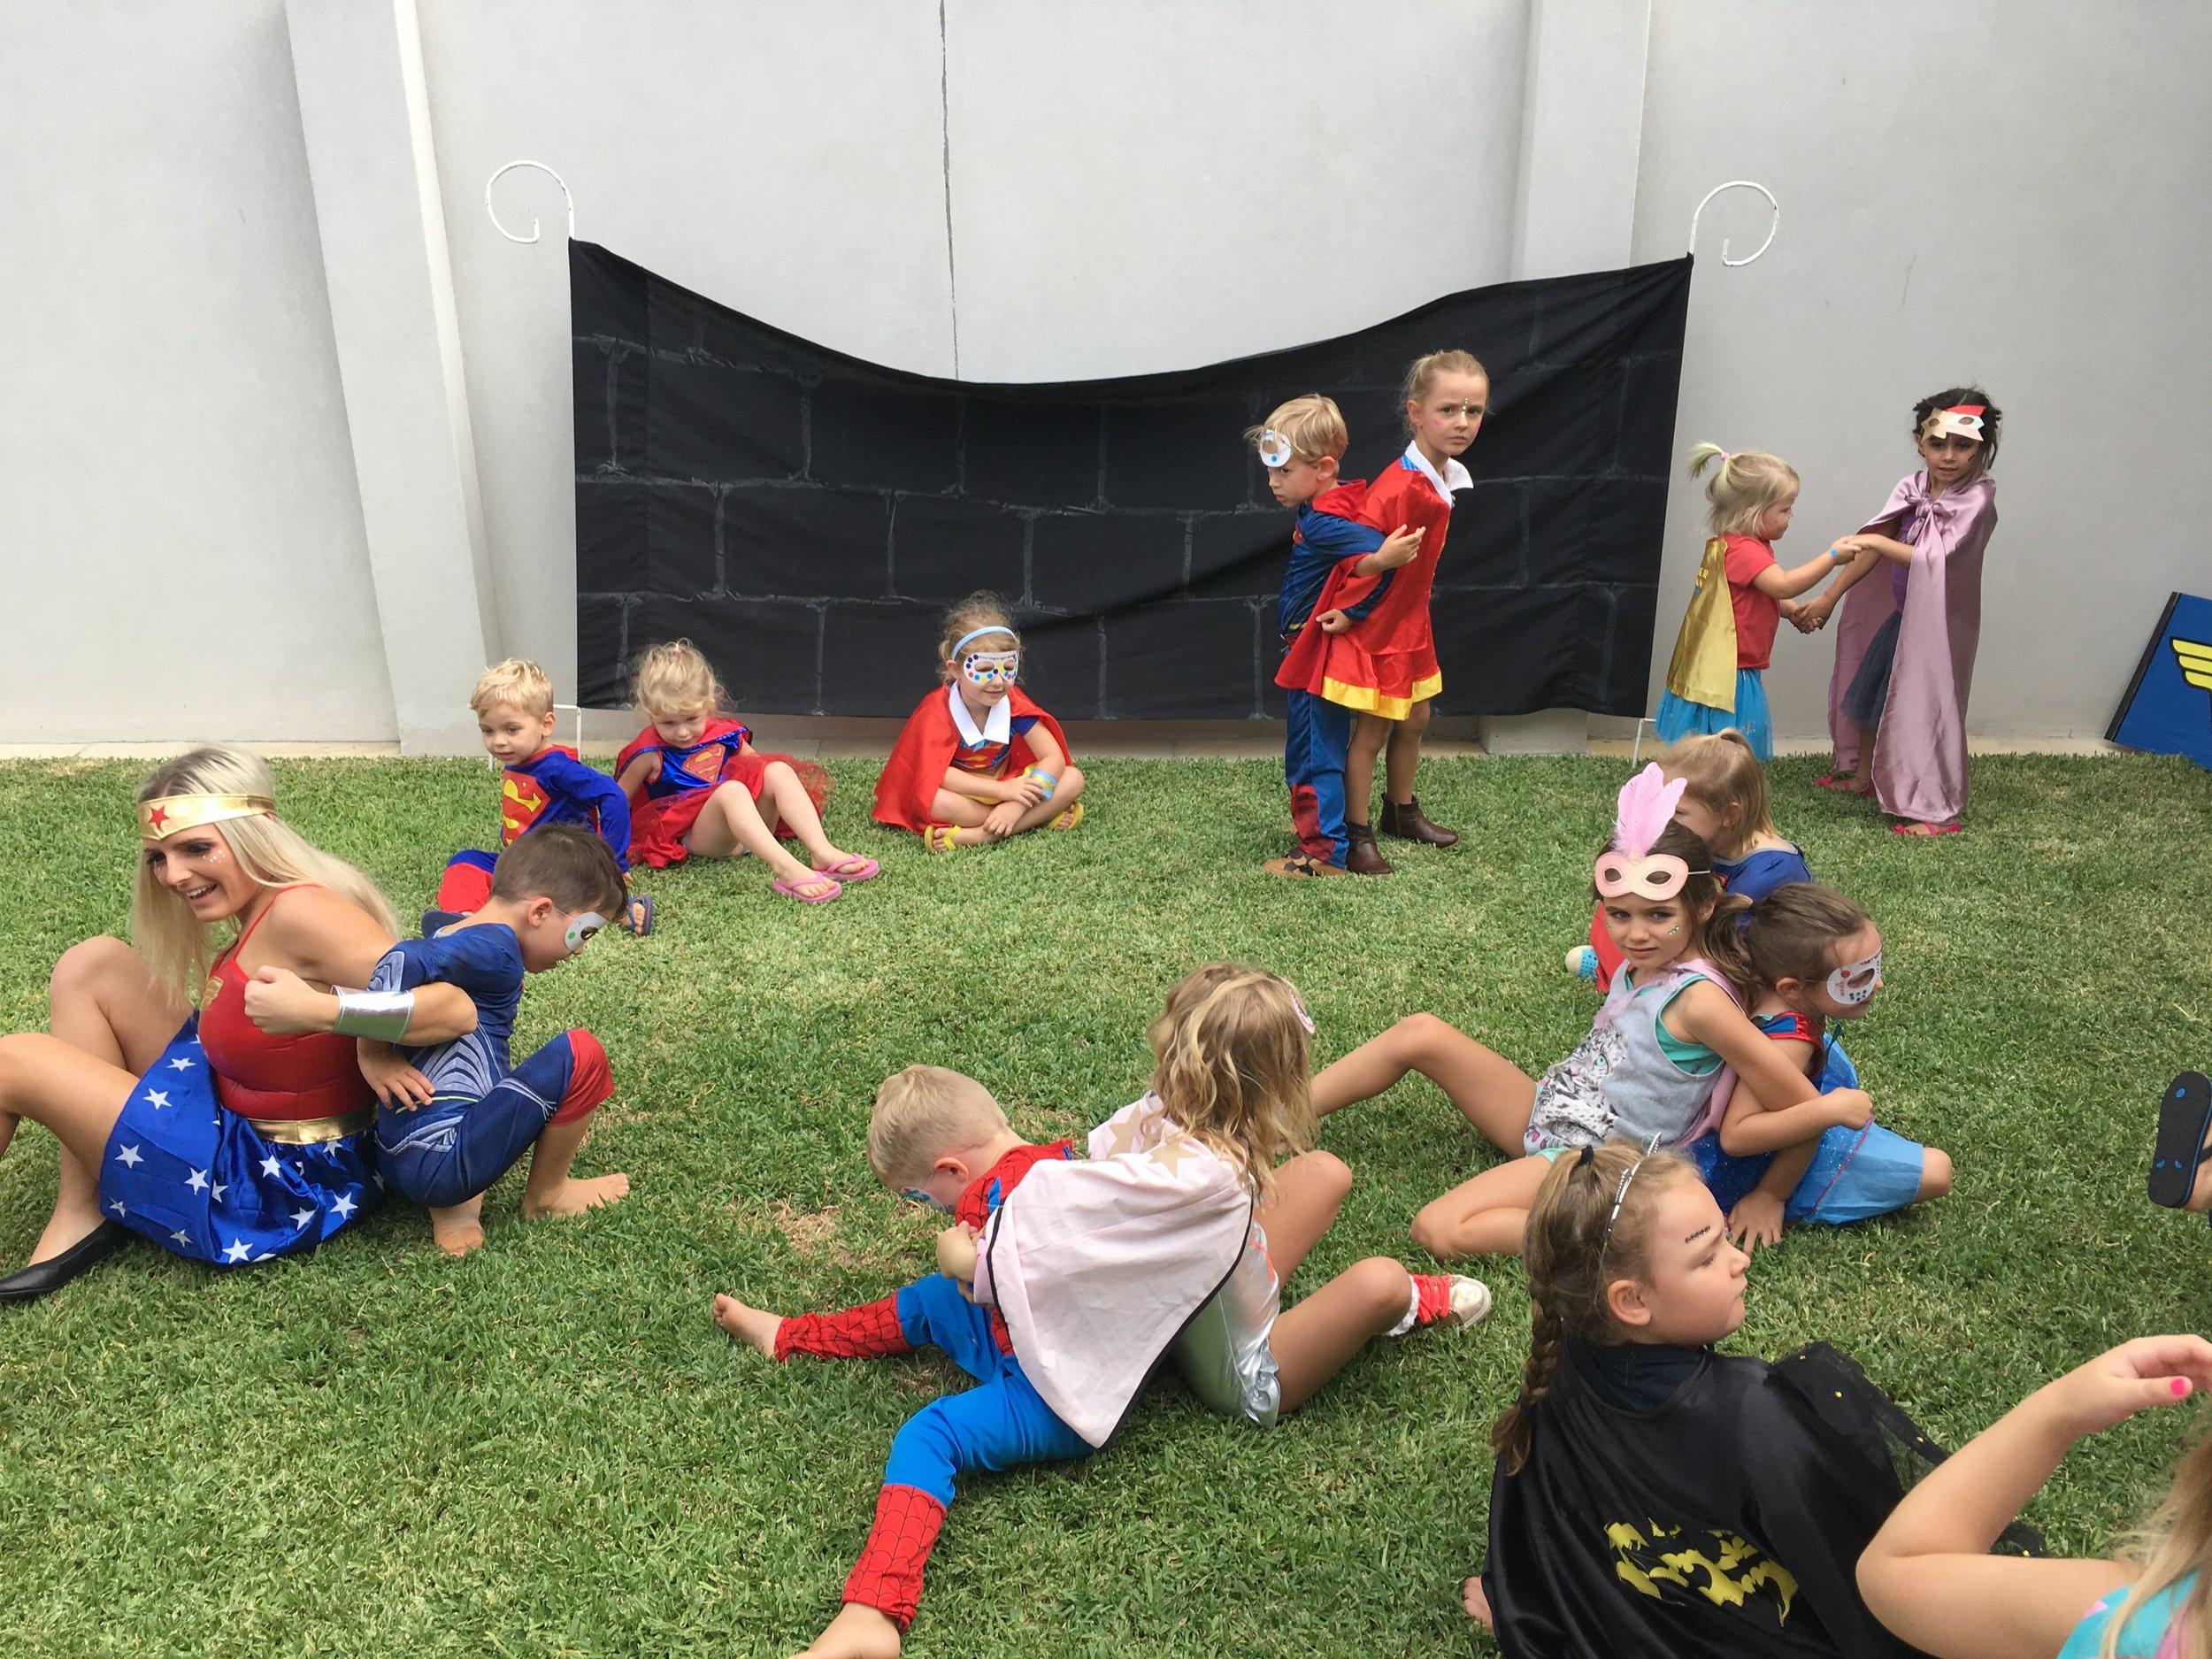 Superhero Party Games